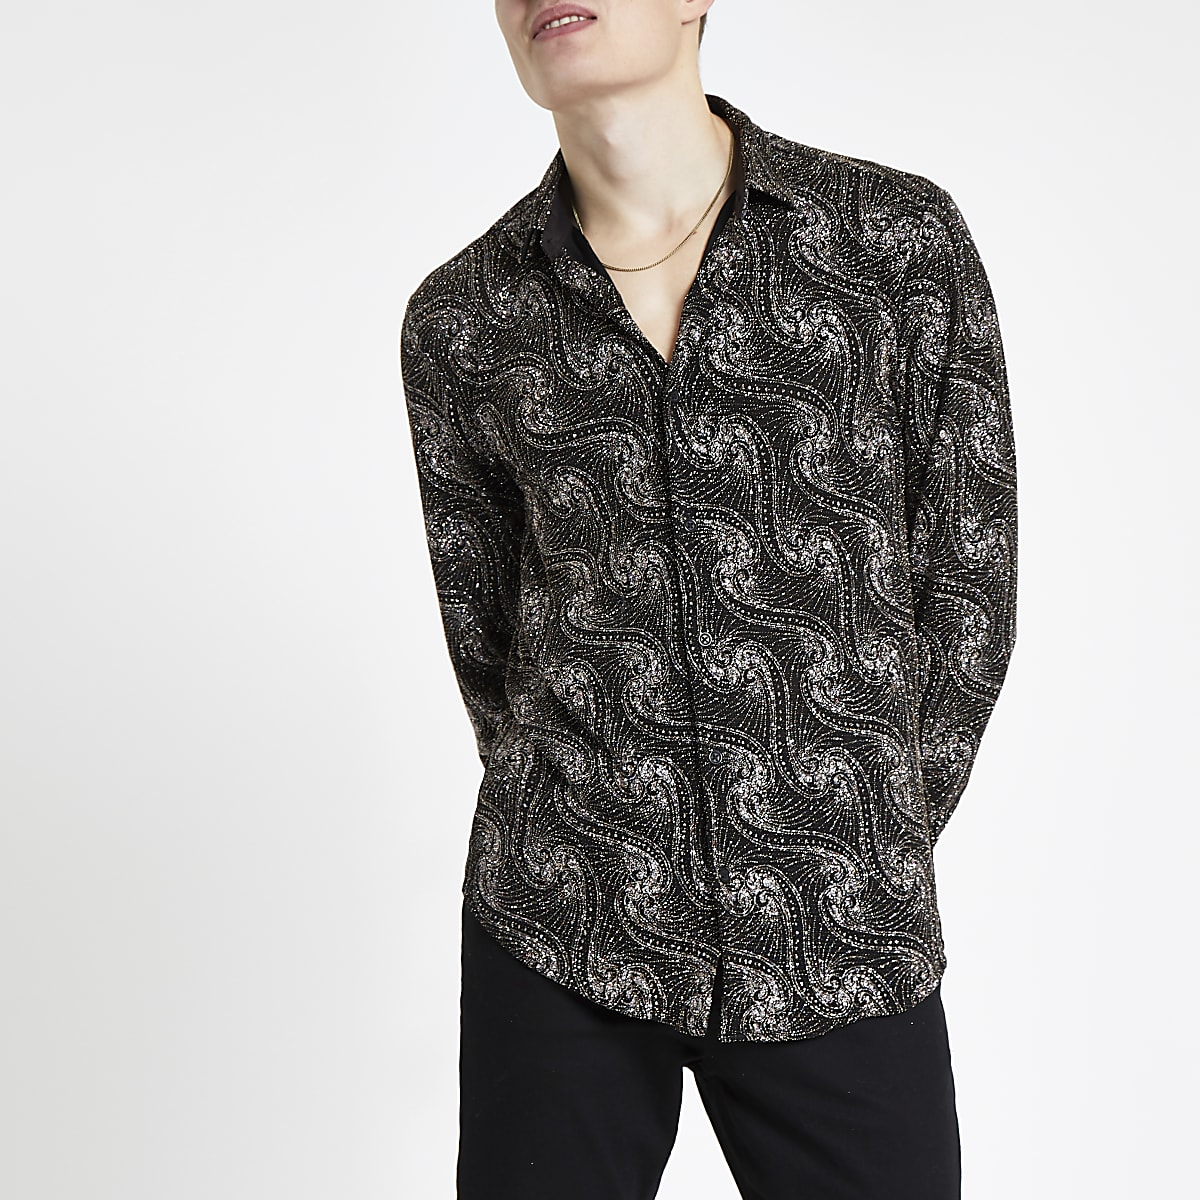 Jaded London black glitter paisley shirt